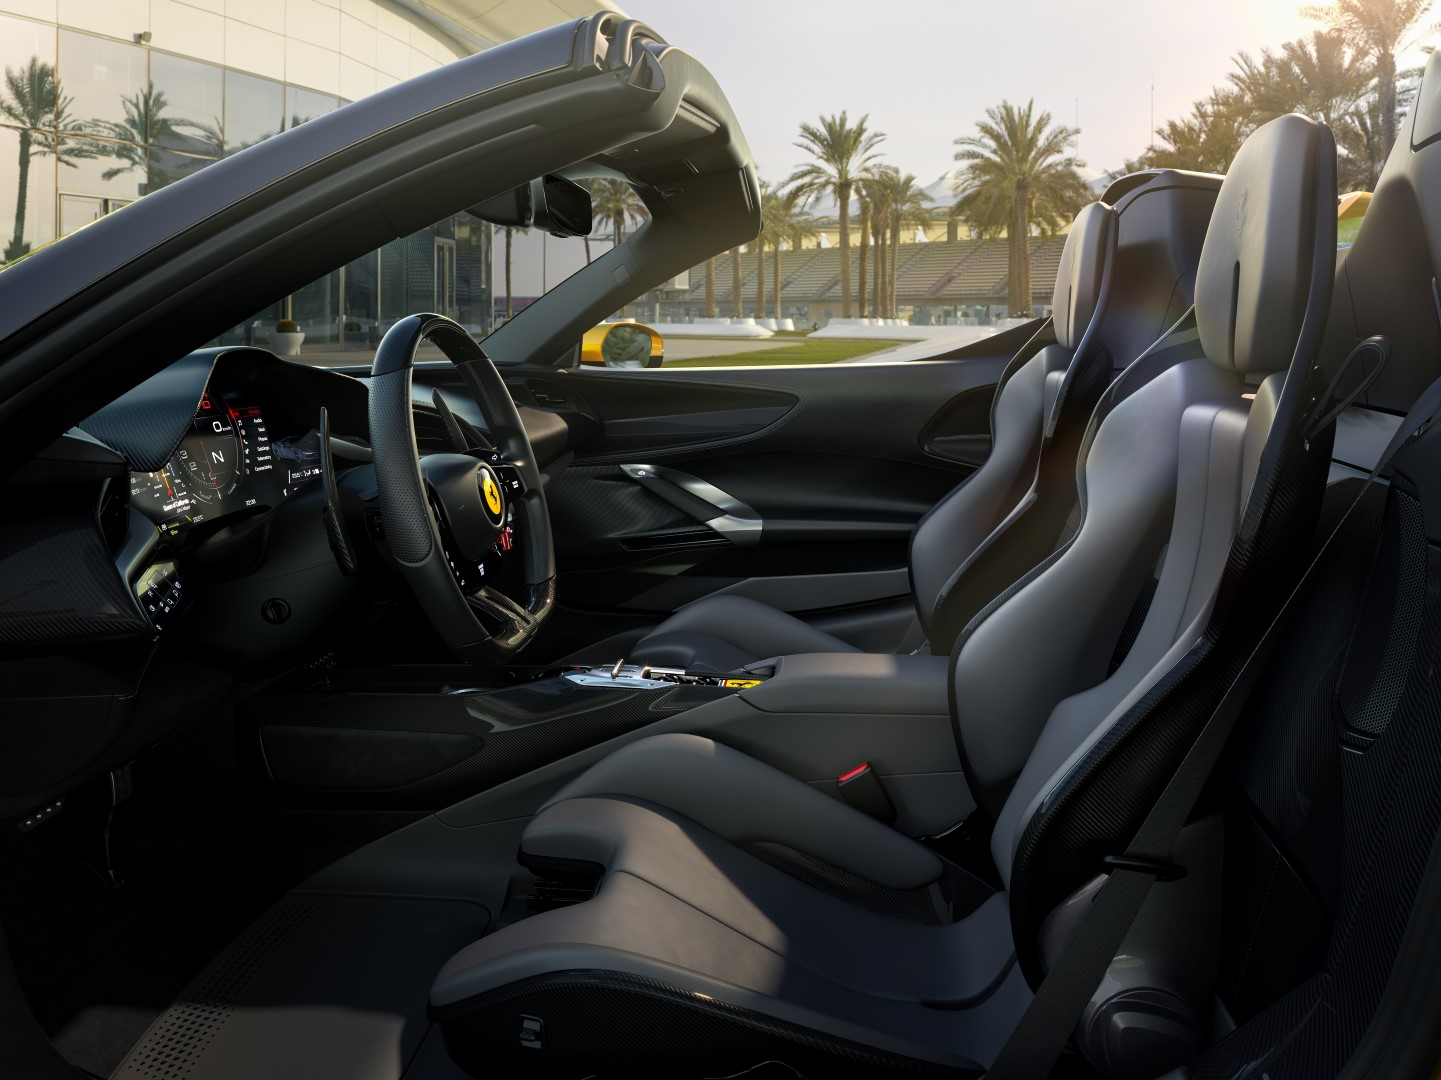 2020 ferrari sf90 spider interior